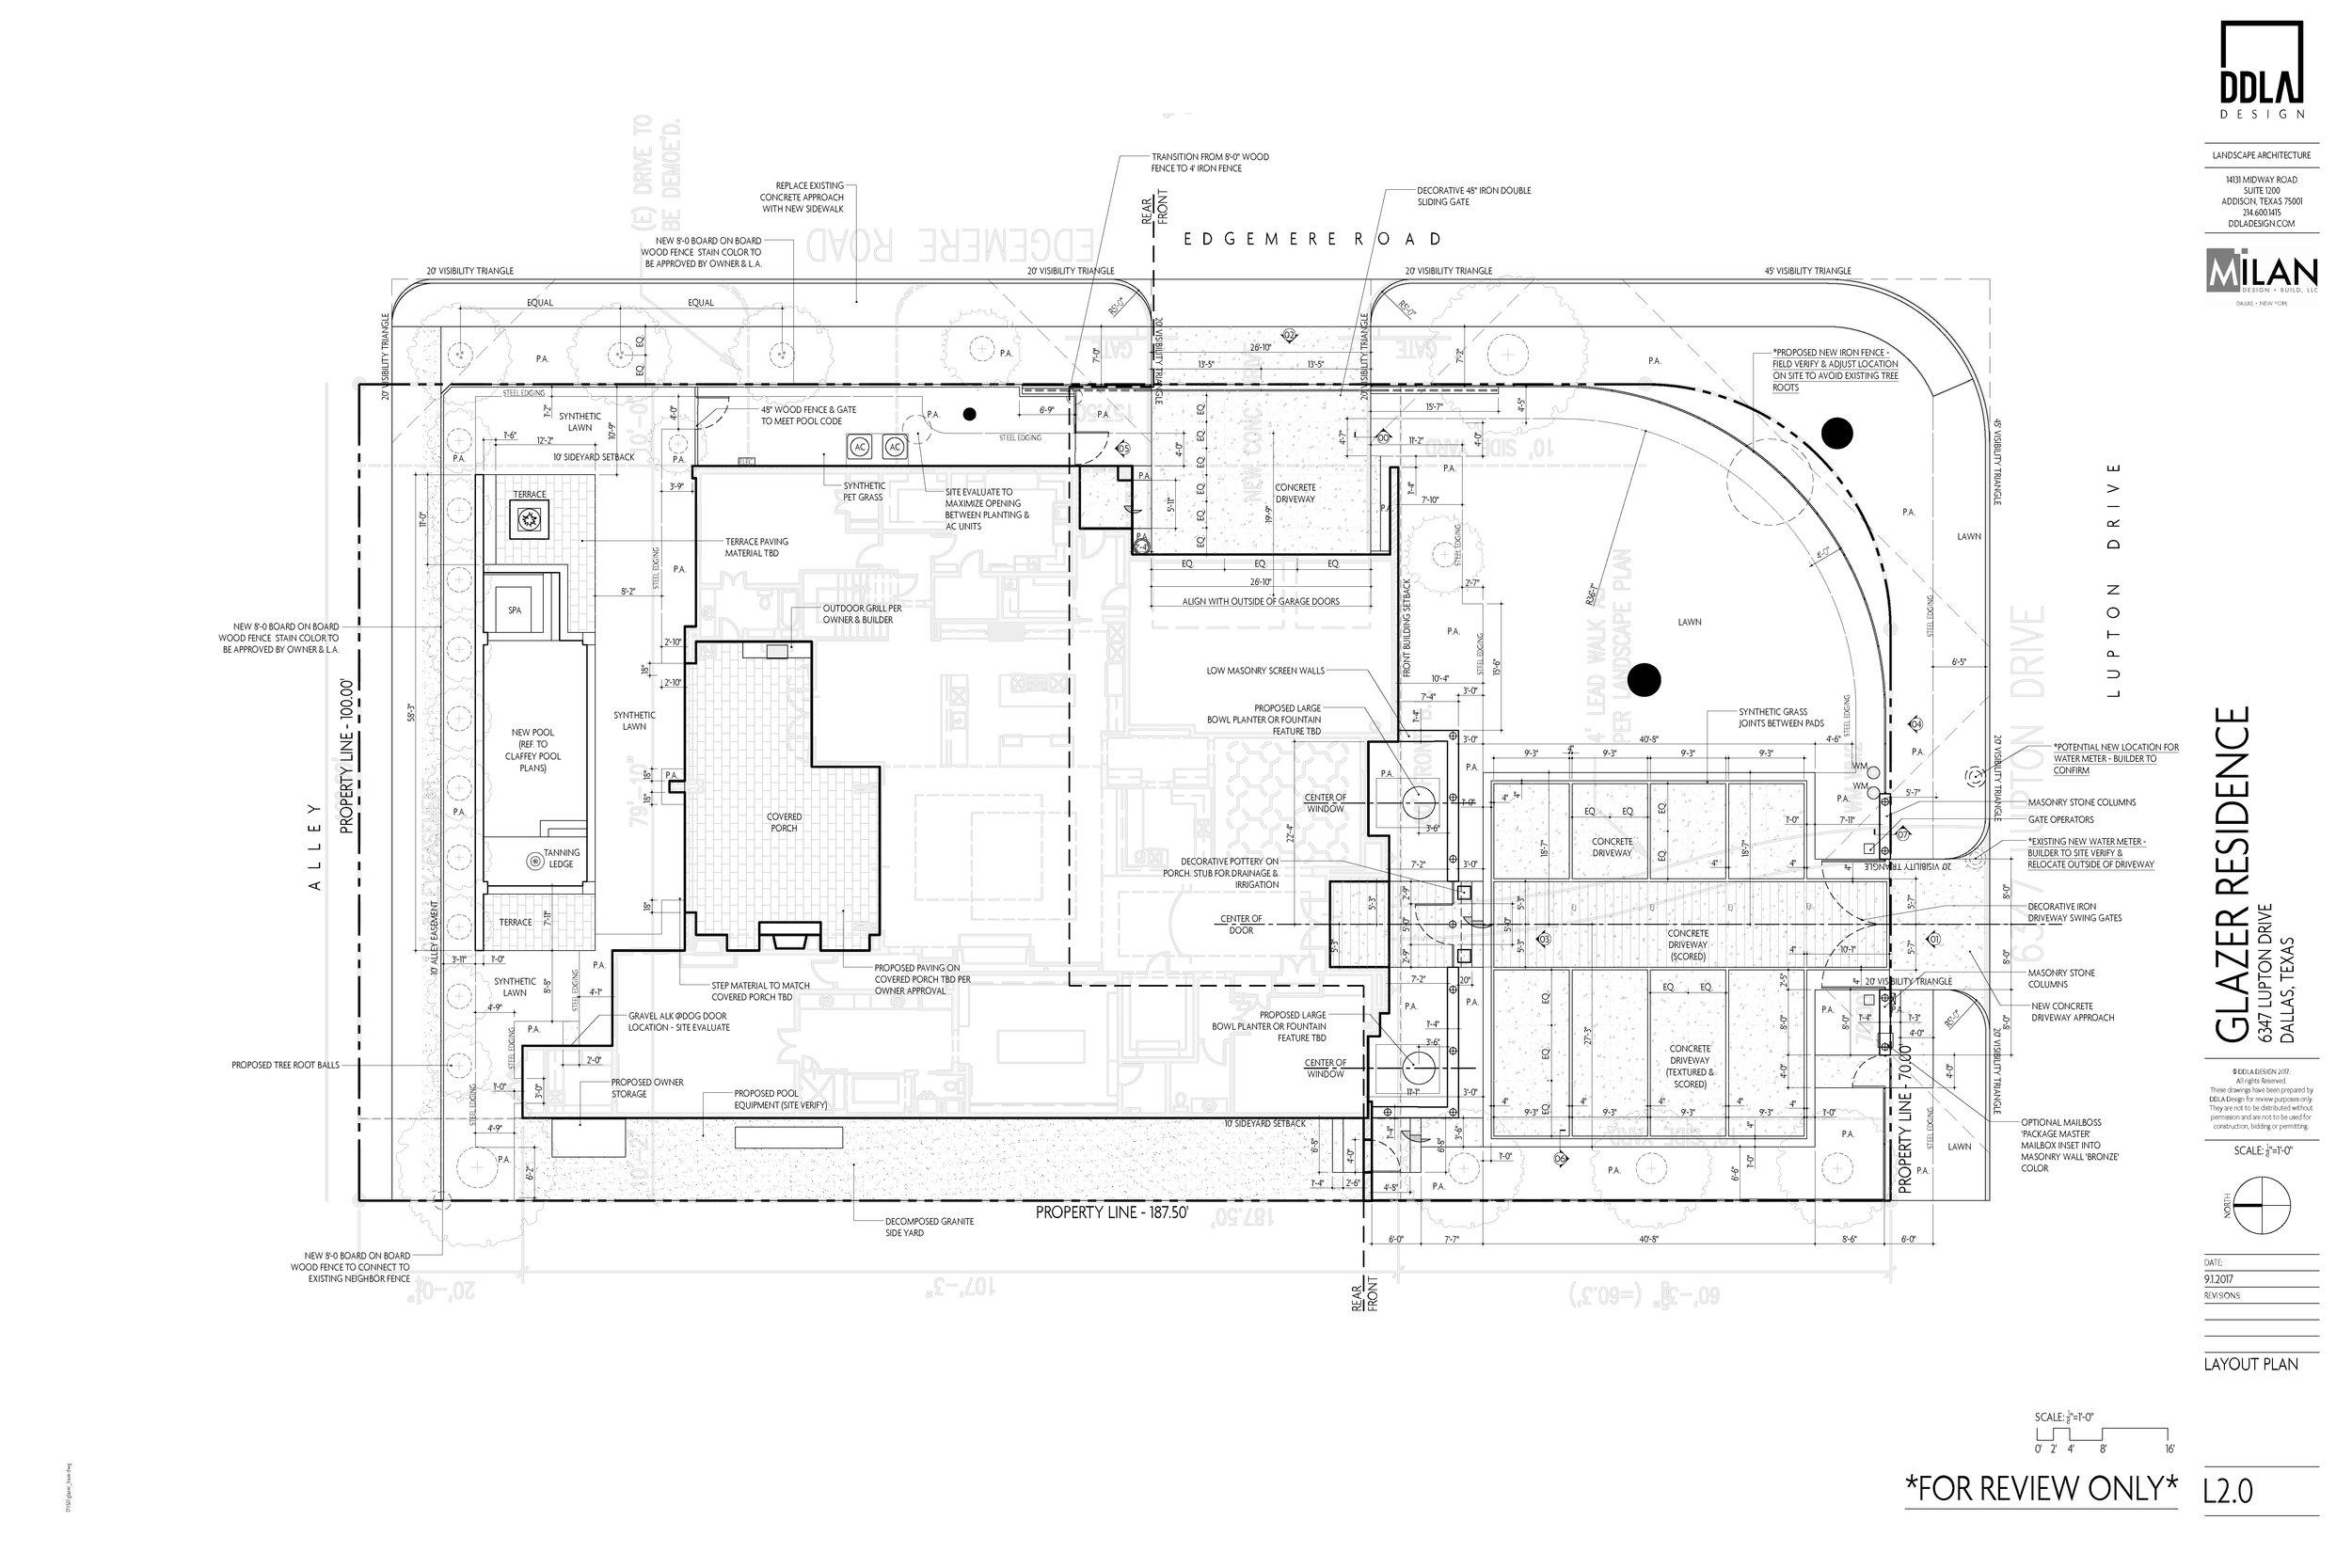 170901 glazer_cd drawing set_Page_3.jpg